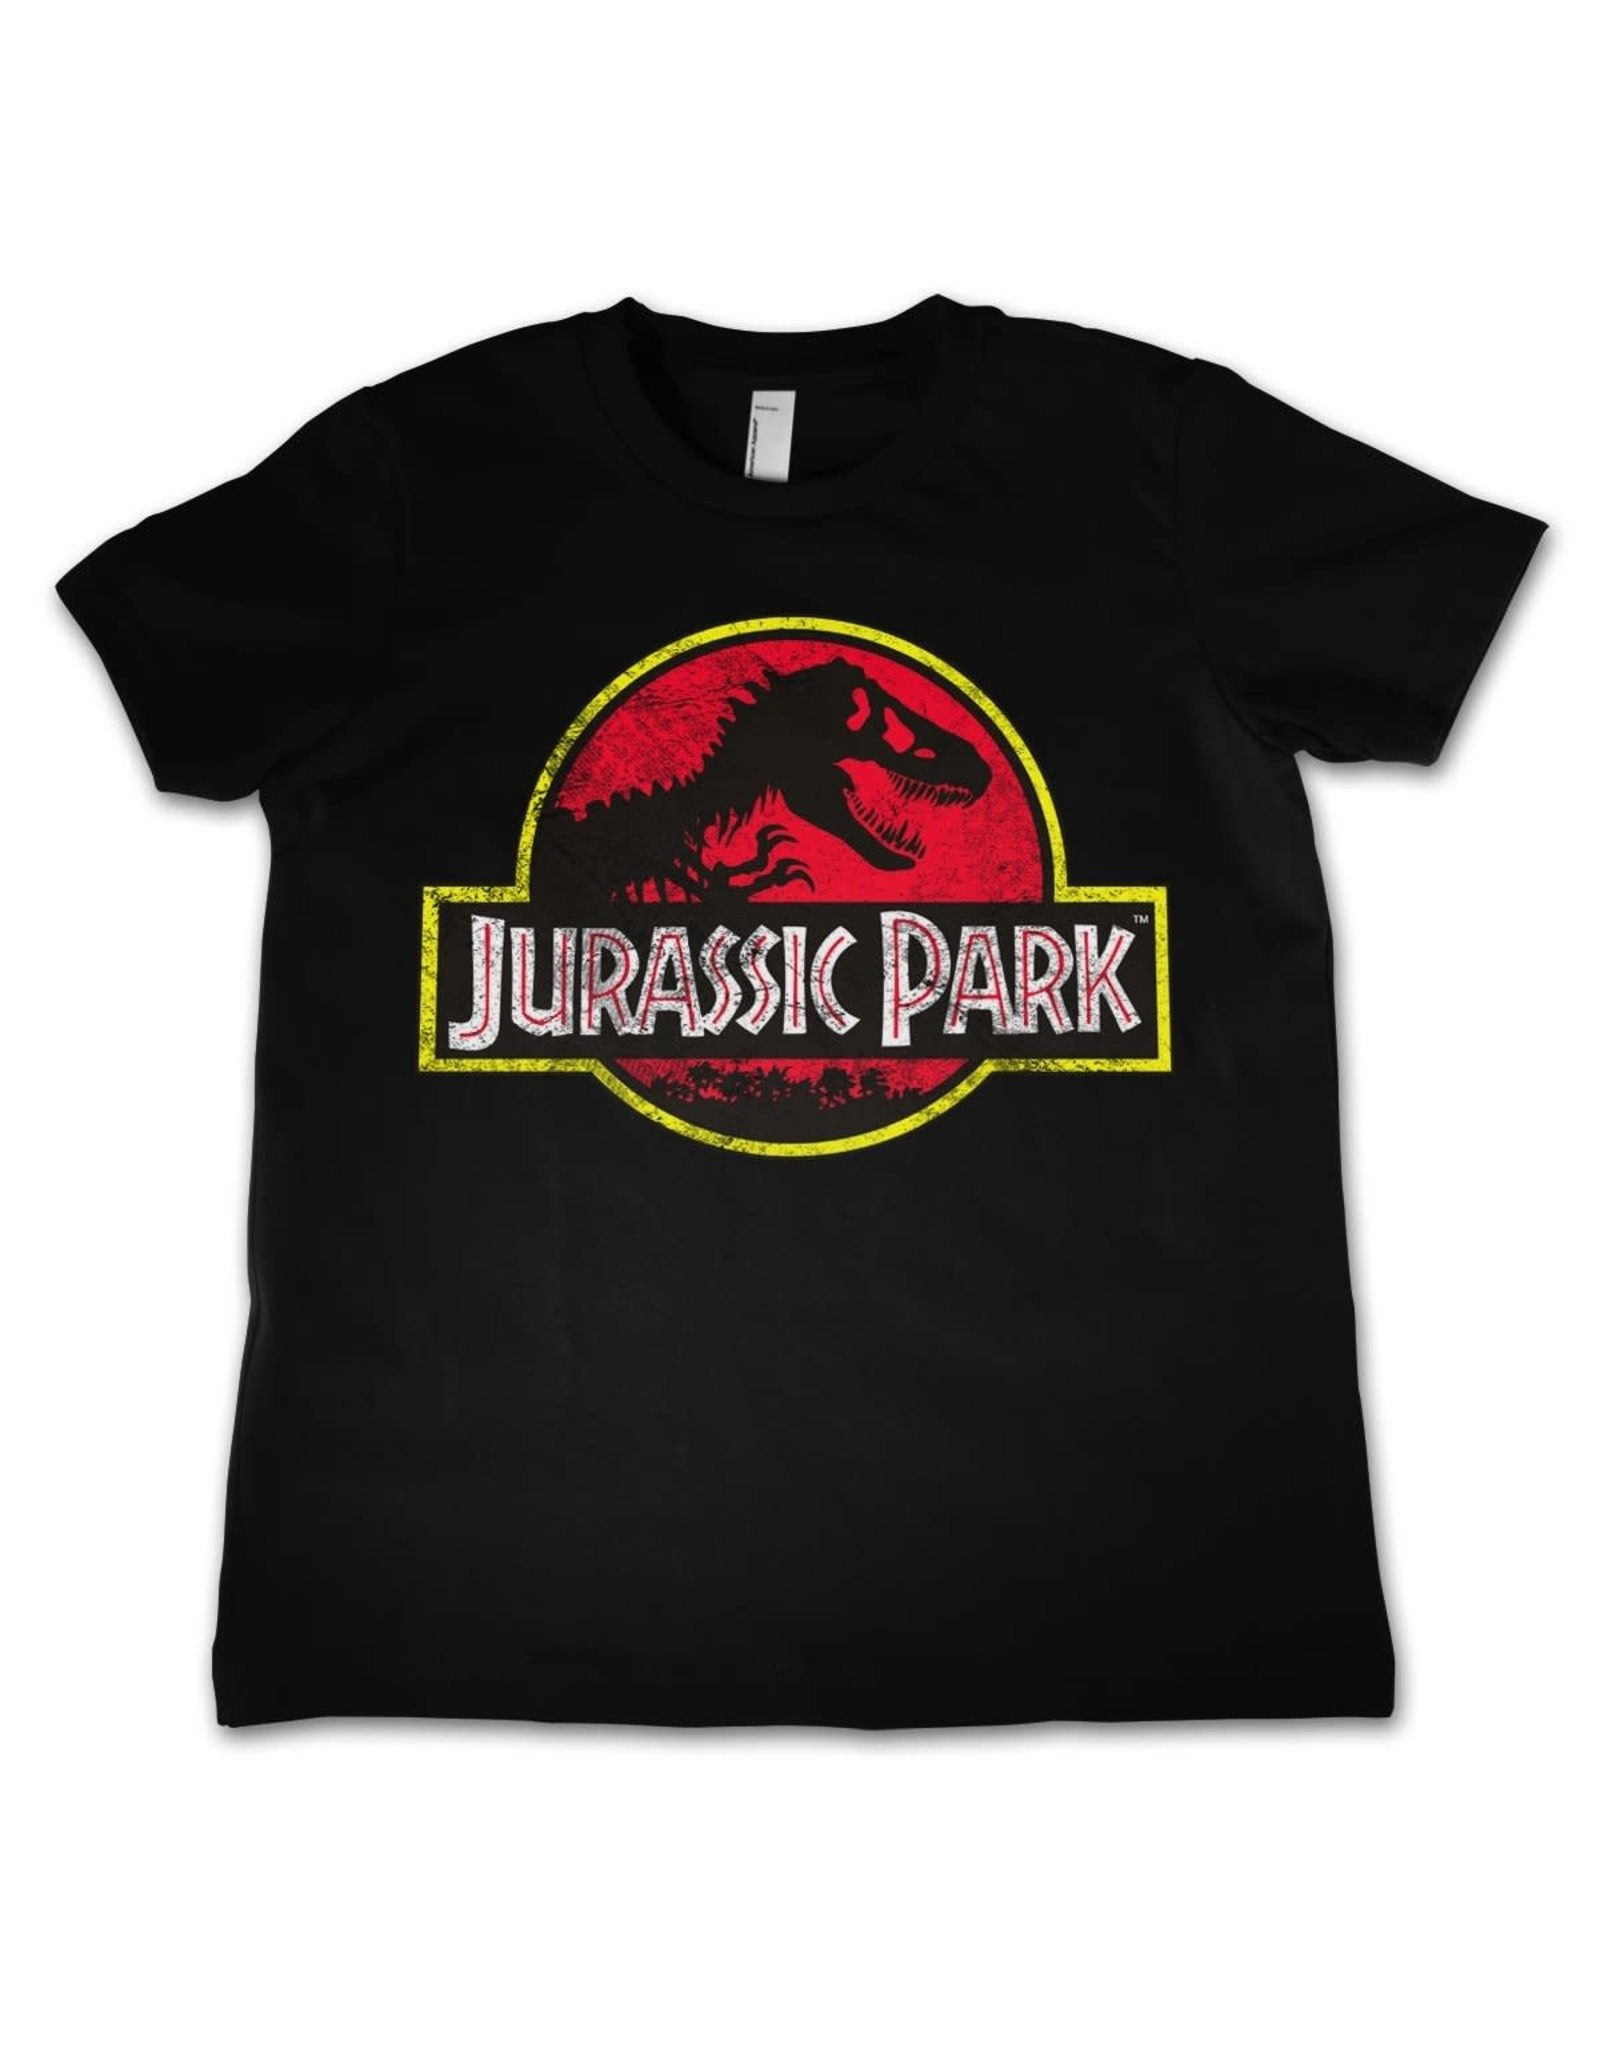 JURASSIC PARK - T-Shirt KIDS Logo Distressed (4 Years)